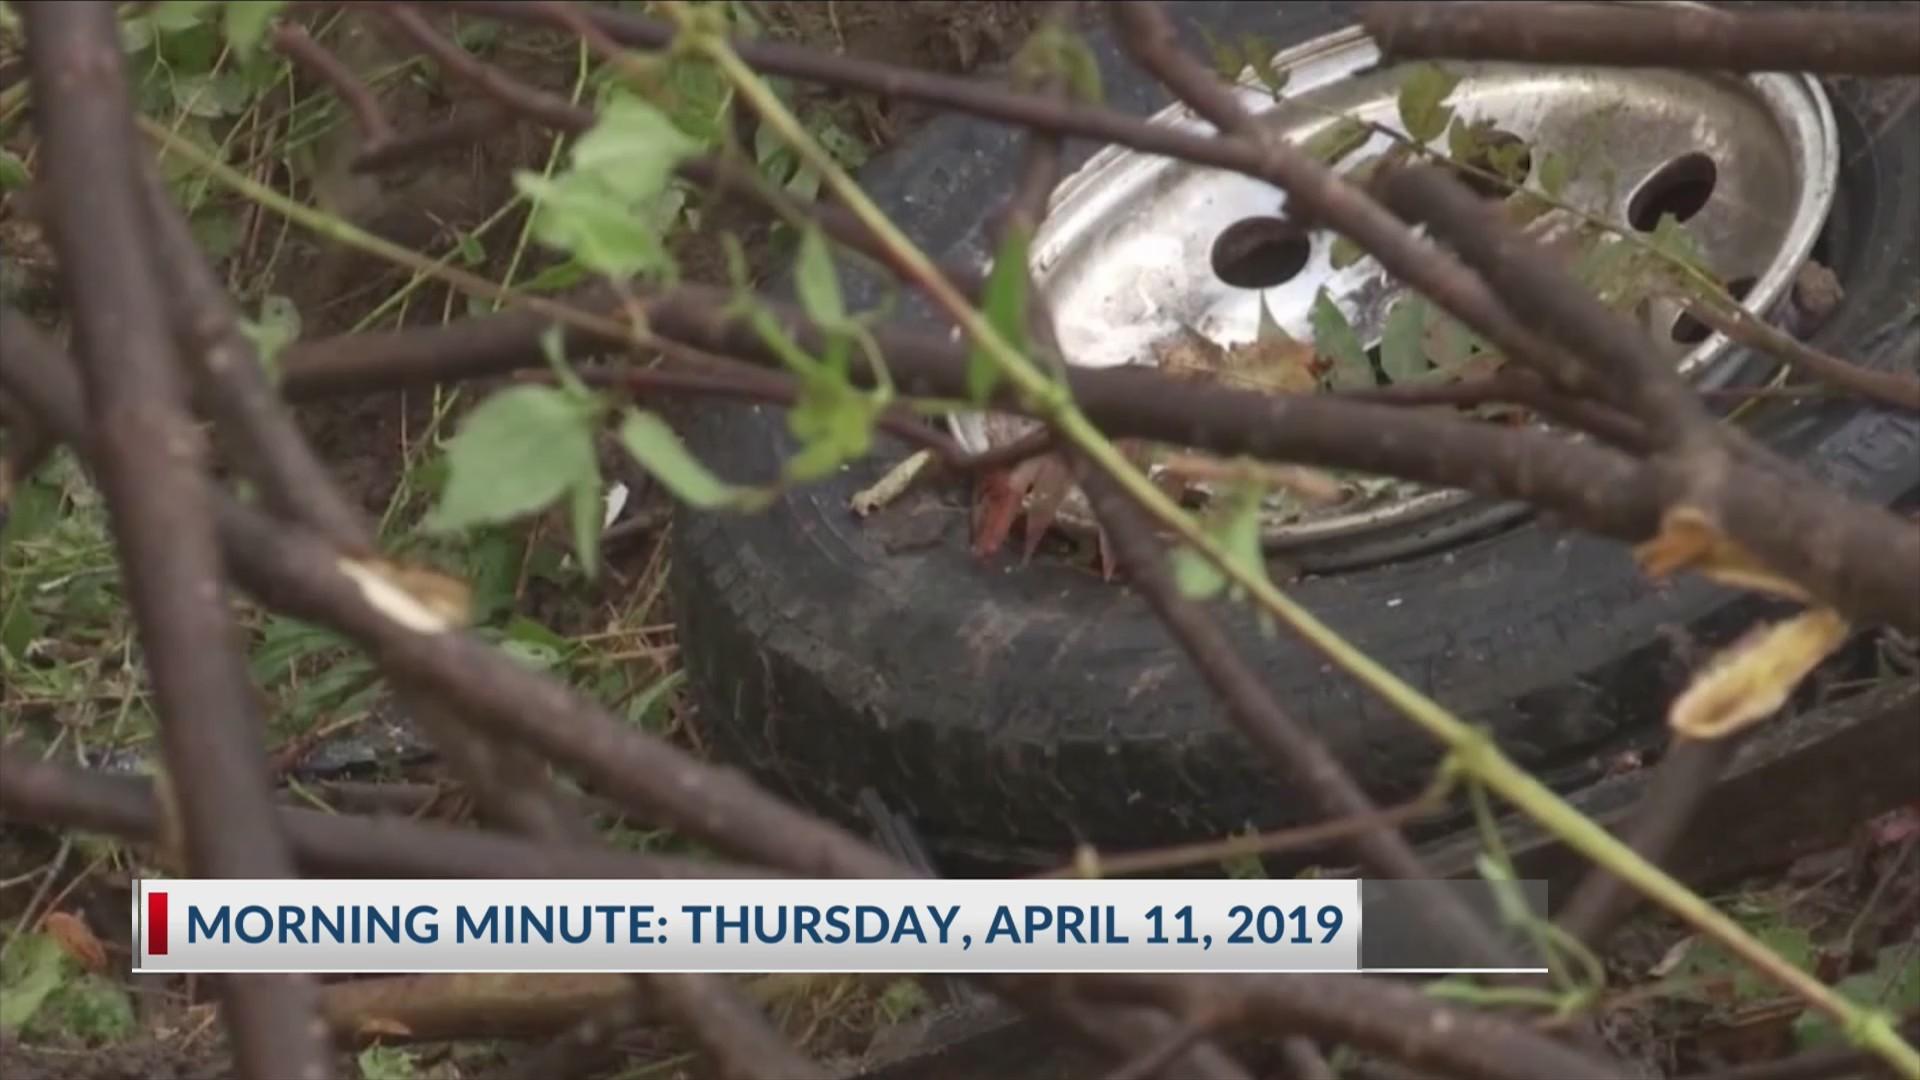 Morning Minute: Thursday, April 11, 2019